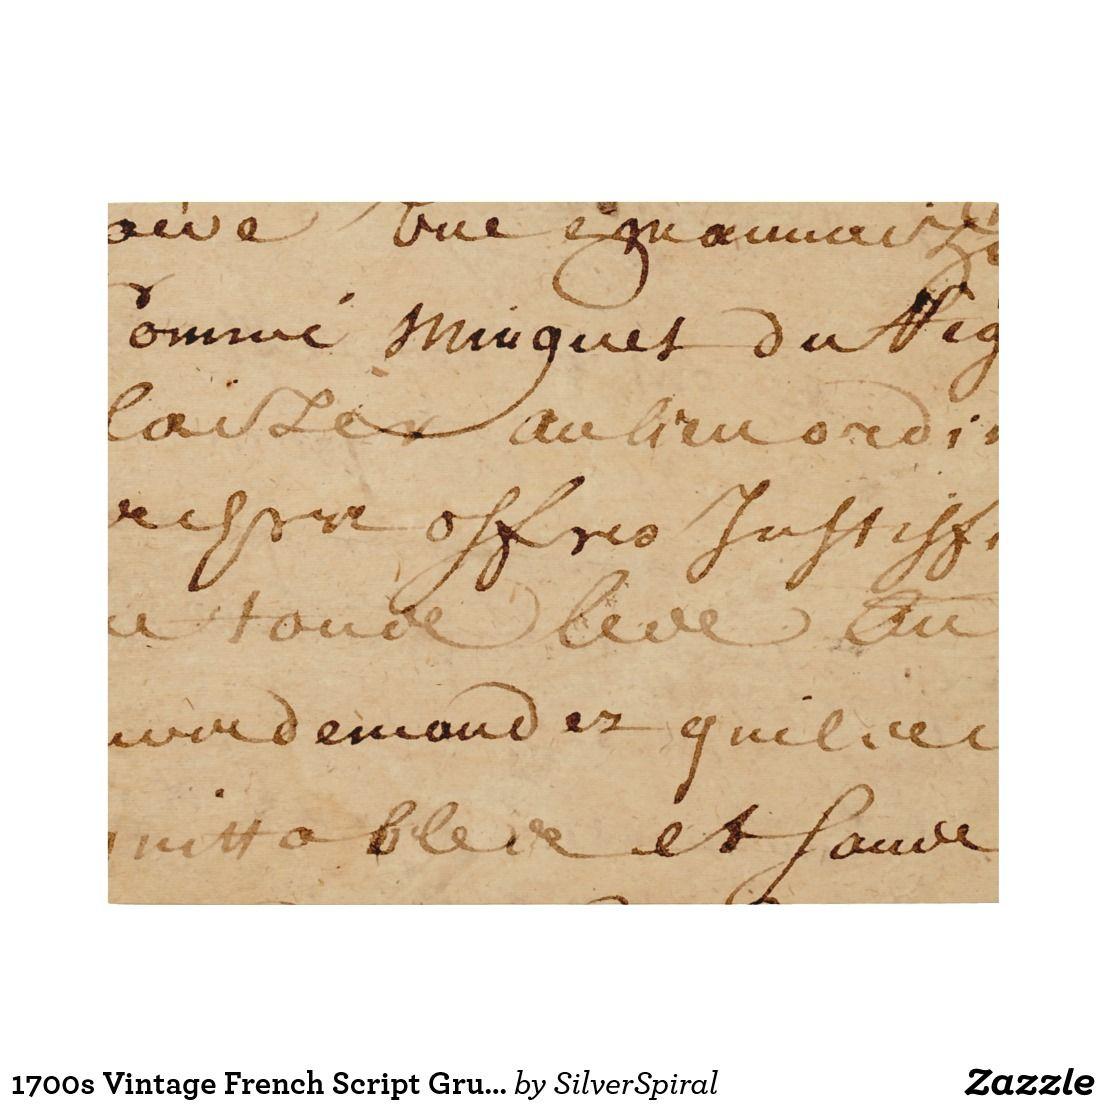 1700s Vintage French Script Grunge Parchment Paper Wood Wall Decor ...